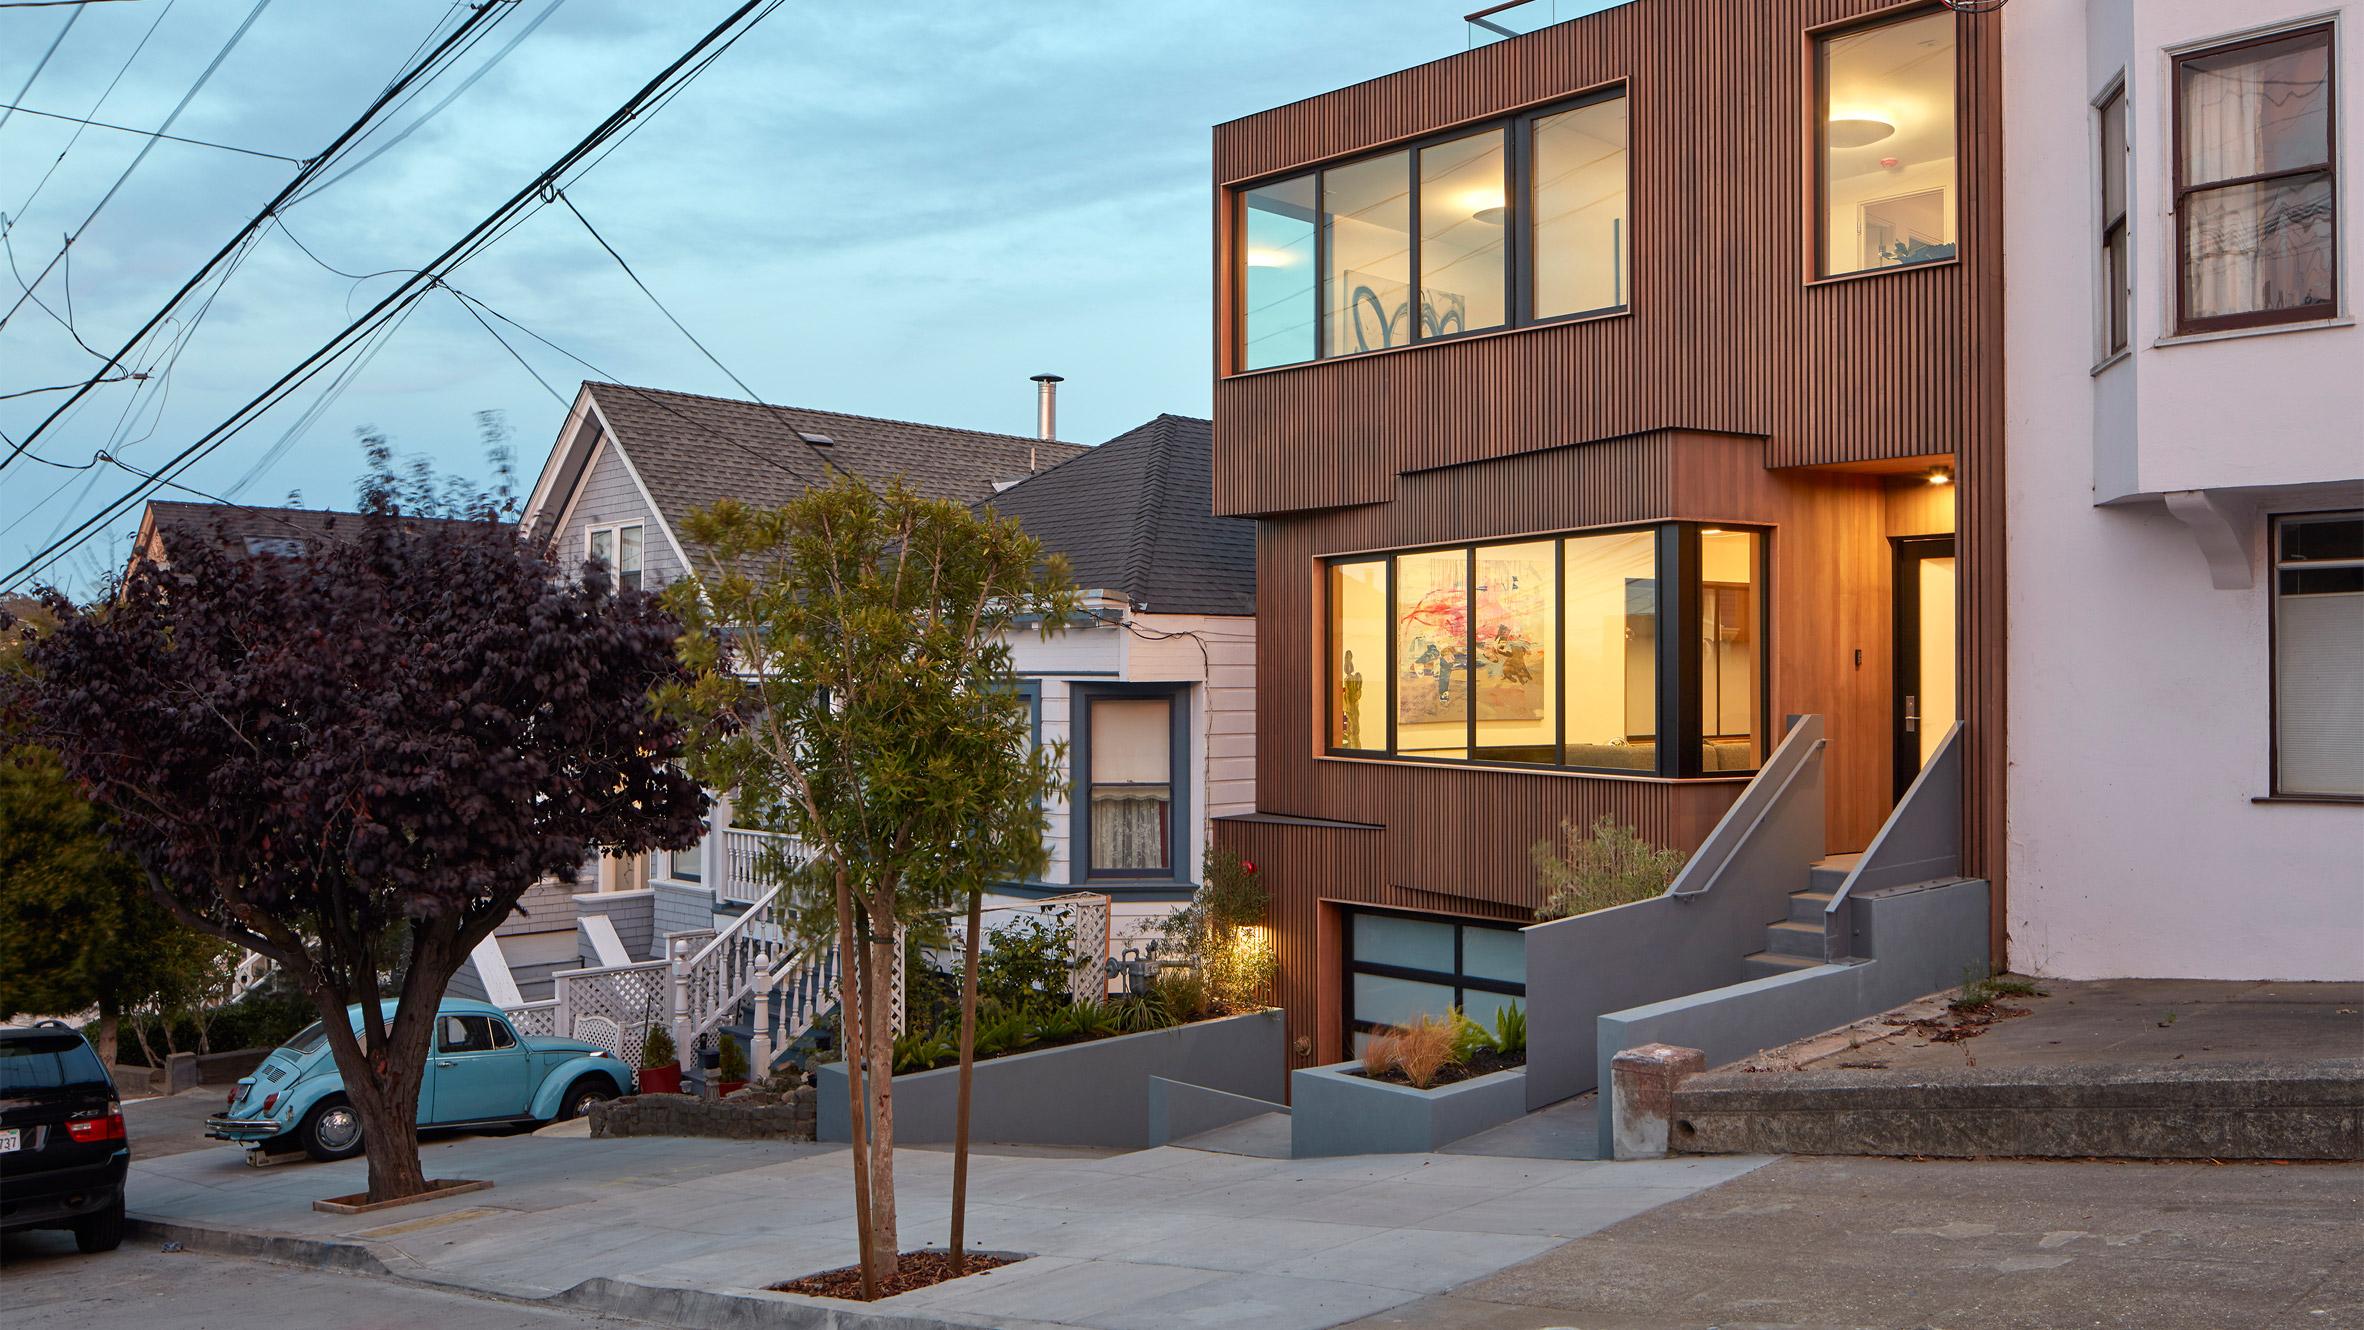 Noe Valley House by IwamotoScott